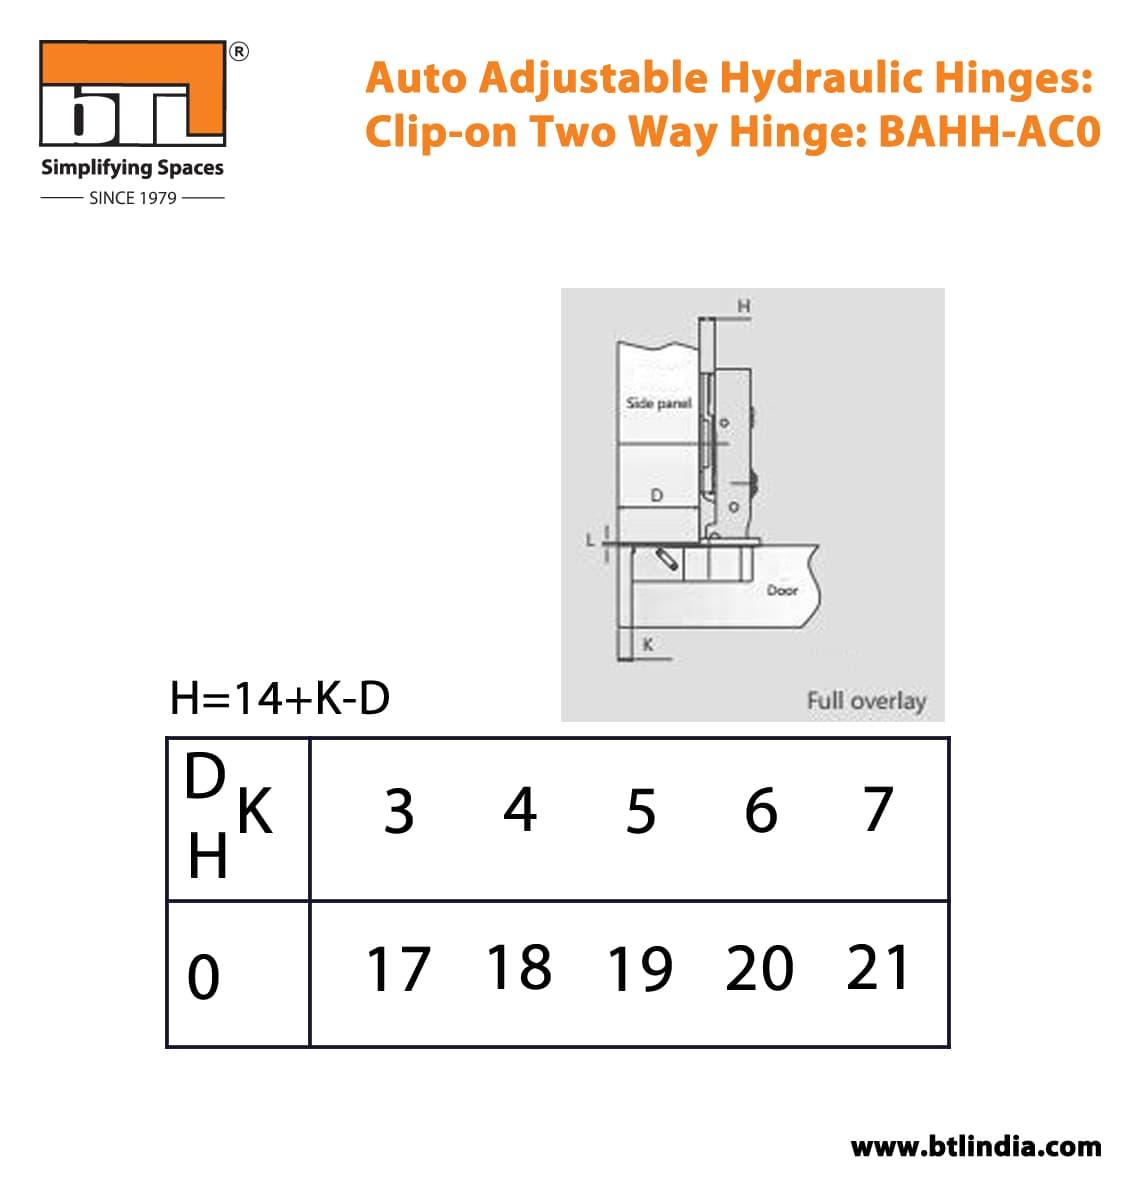 BTL BAHH-AC0 Auto Adjustable Hydraulic Hinges Clip On Two Way Hinge - Full Overlay